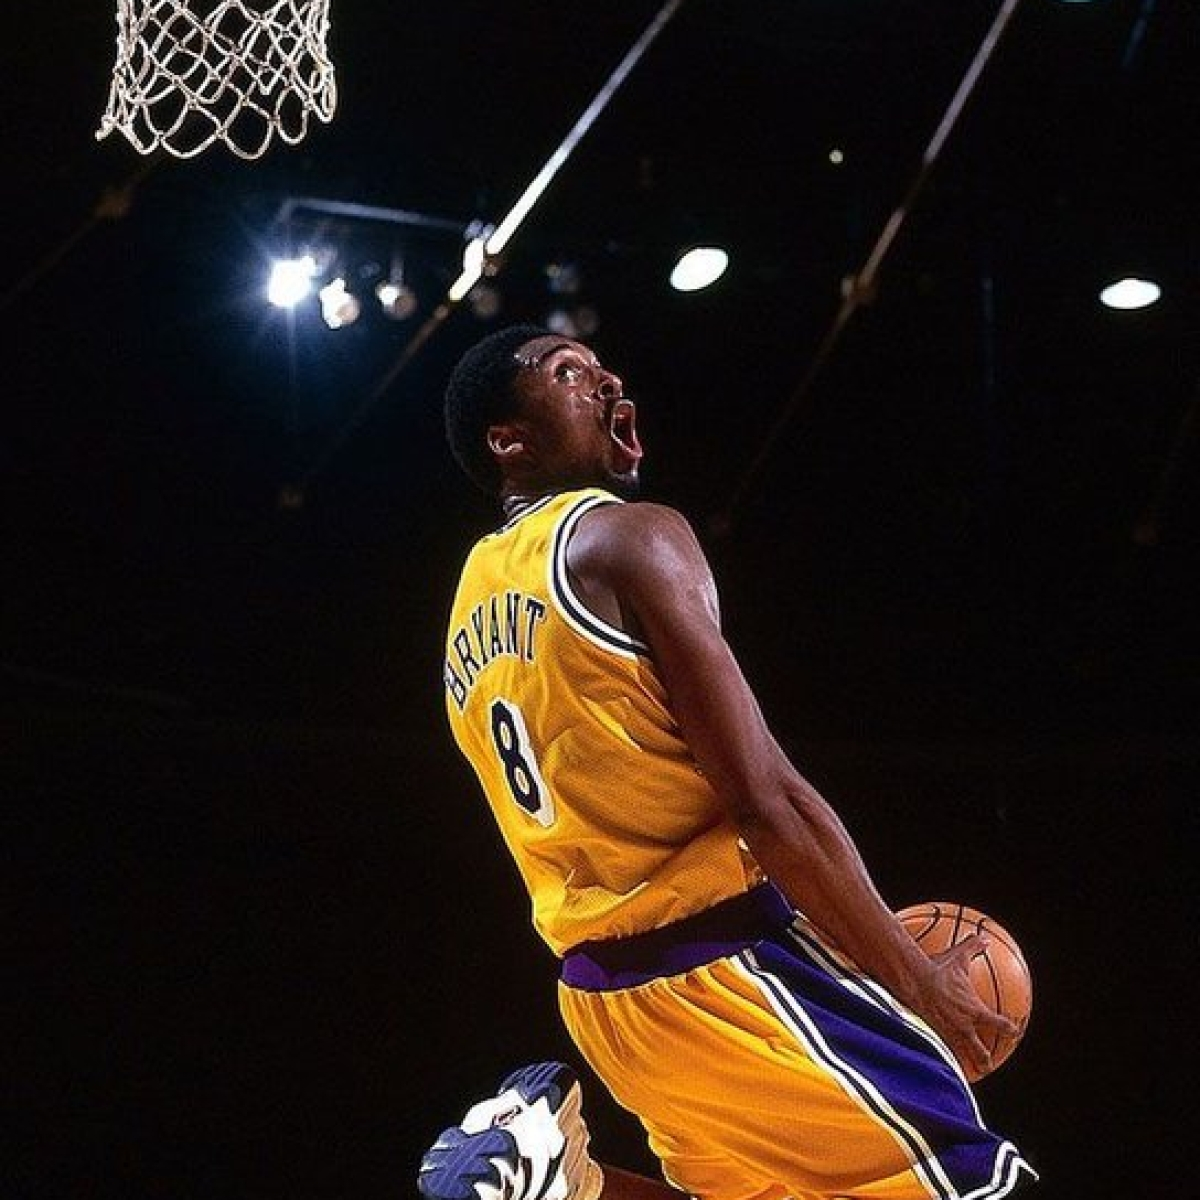 New Philadelphia Eagles Slay's tribute to Kobe Bryant